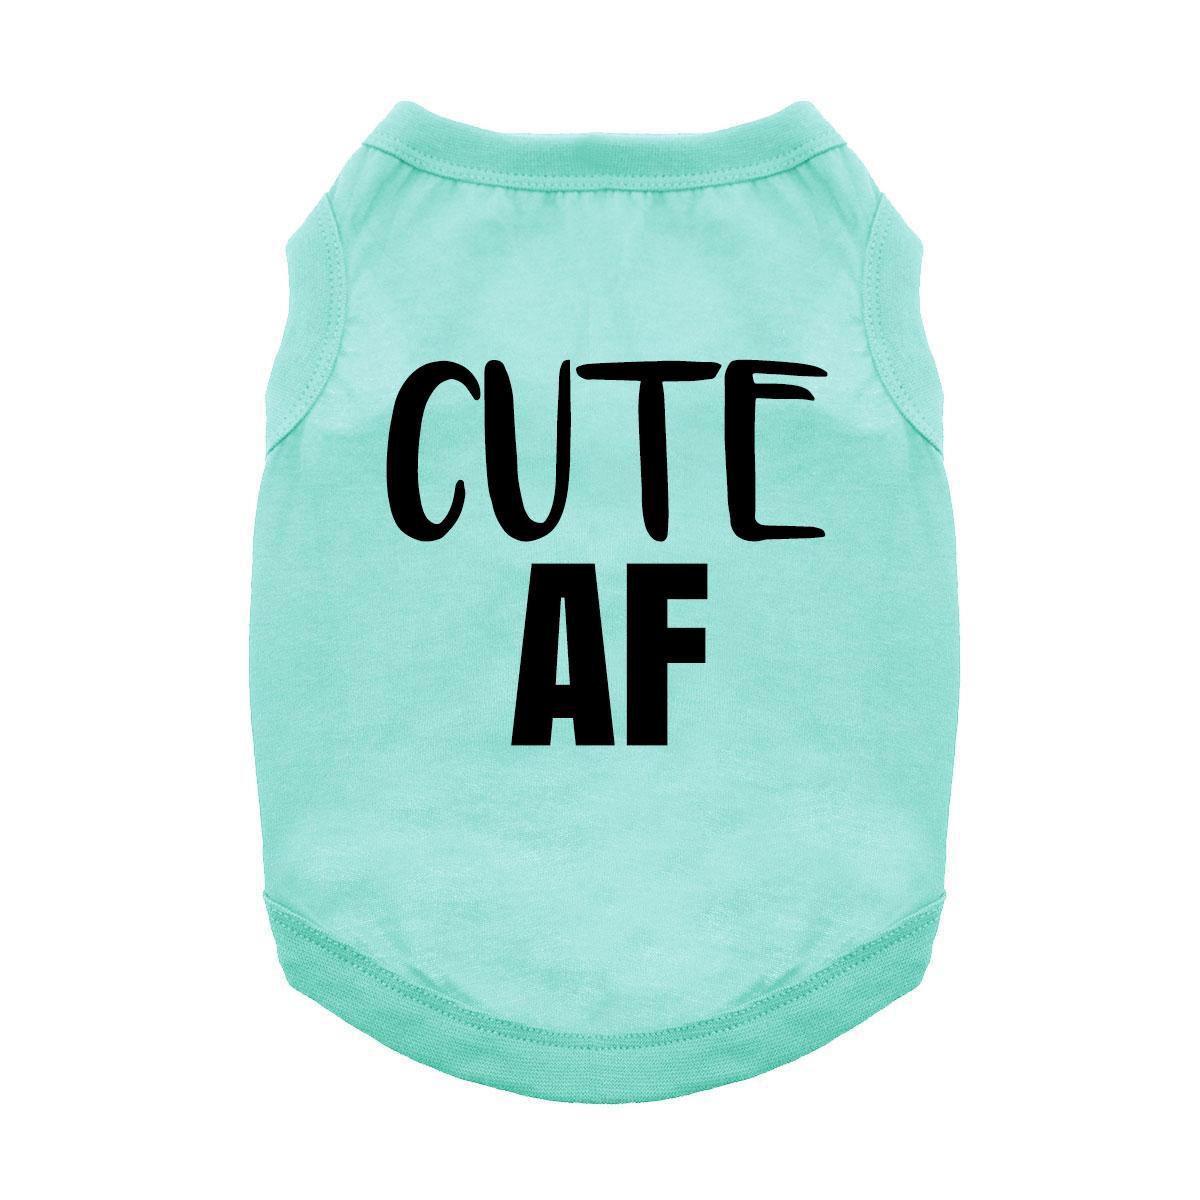 Cute AF Dog Shirt - Teal